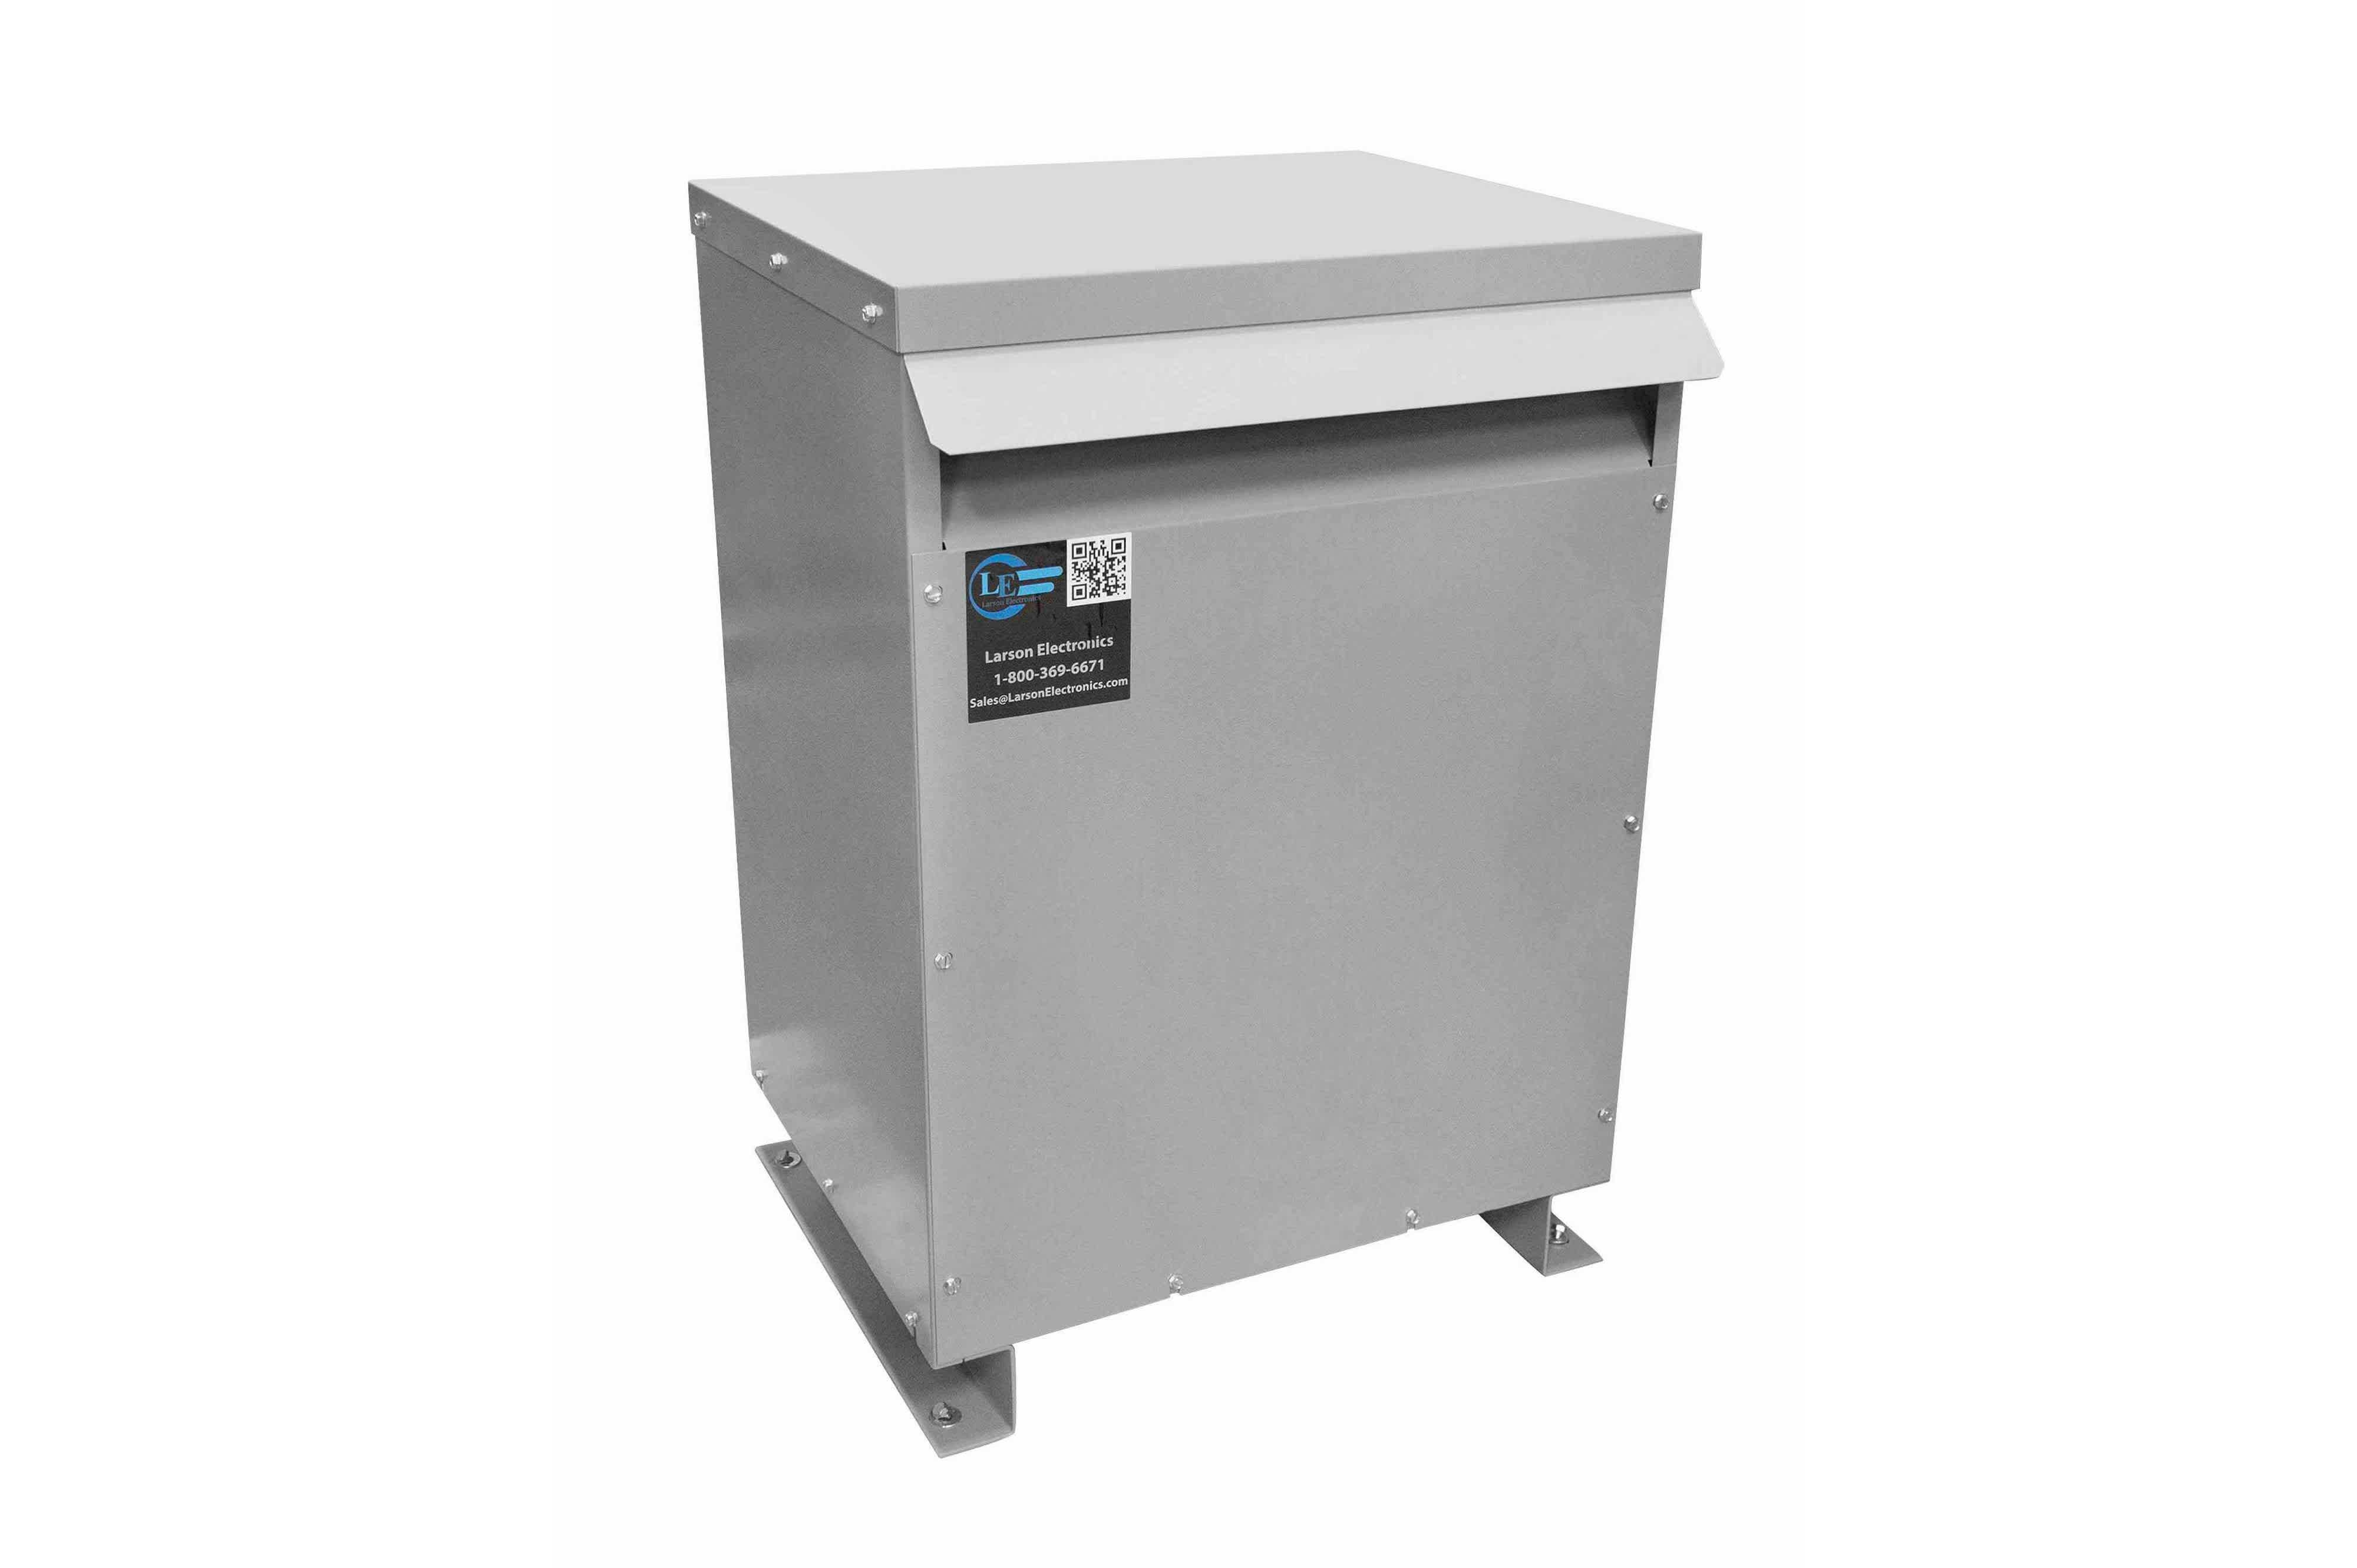 167 kVA 3PH Isolation Transformer, 208V Wye Primary, 208V Delta Secondary, N3R, Ventilated, 60 Hz